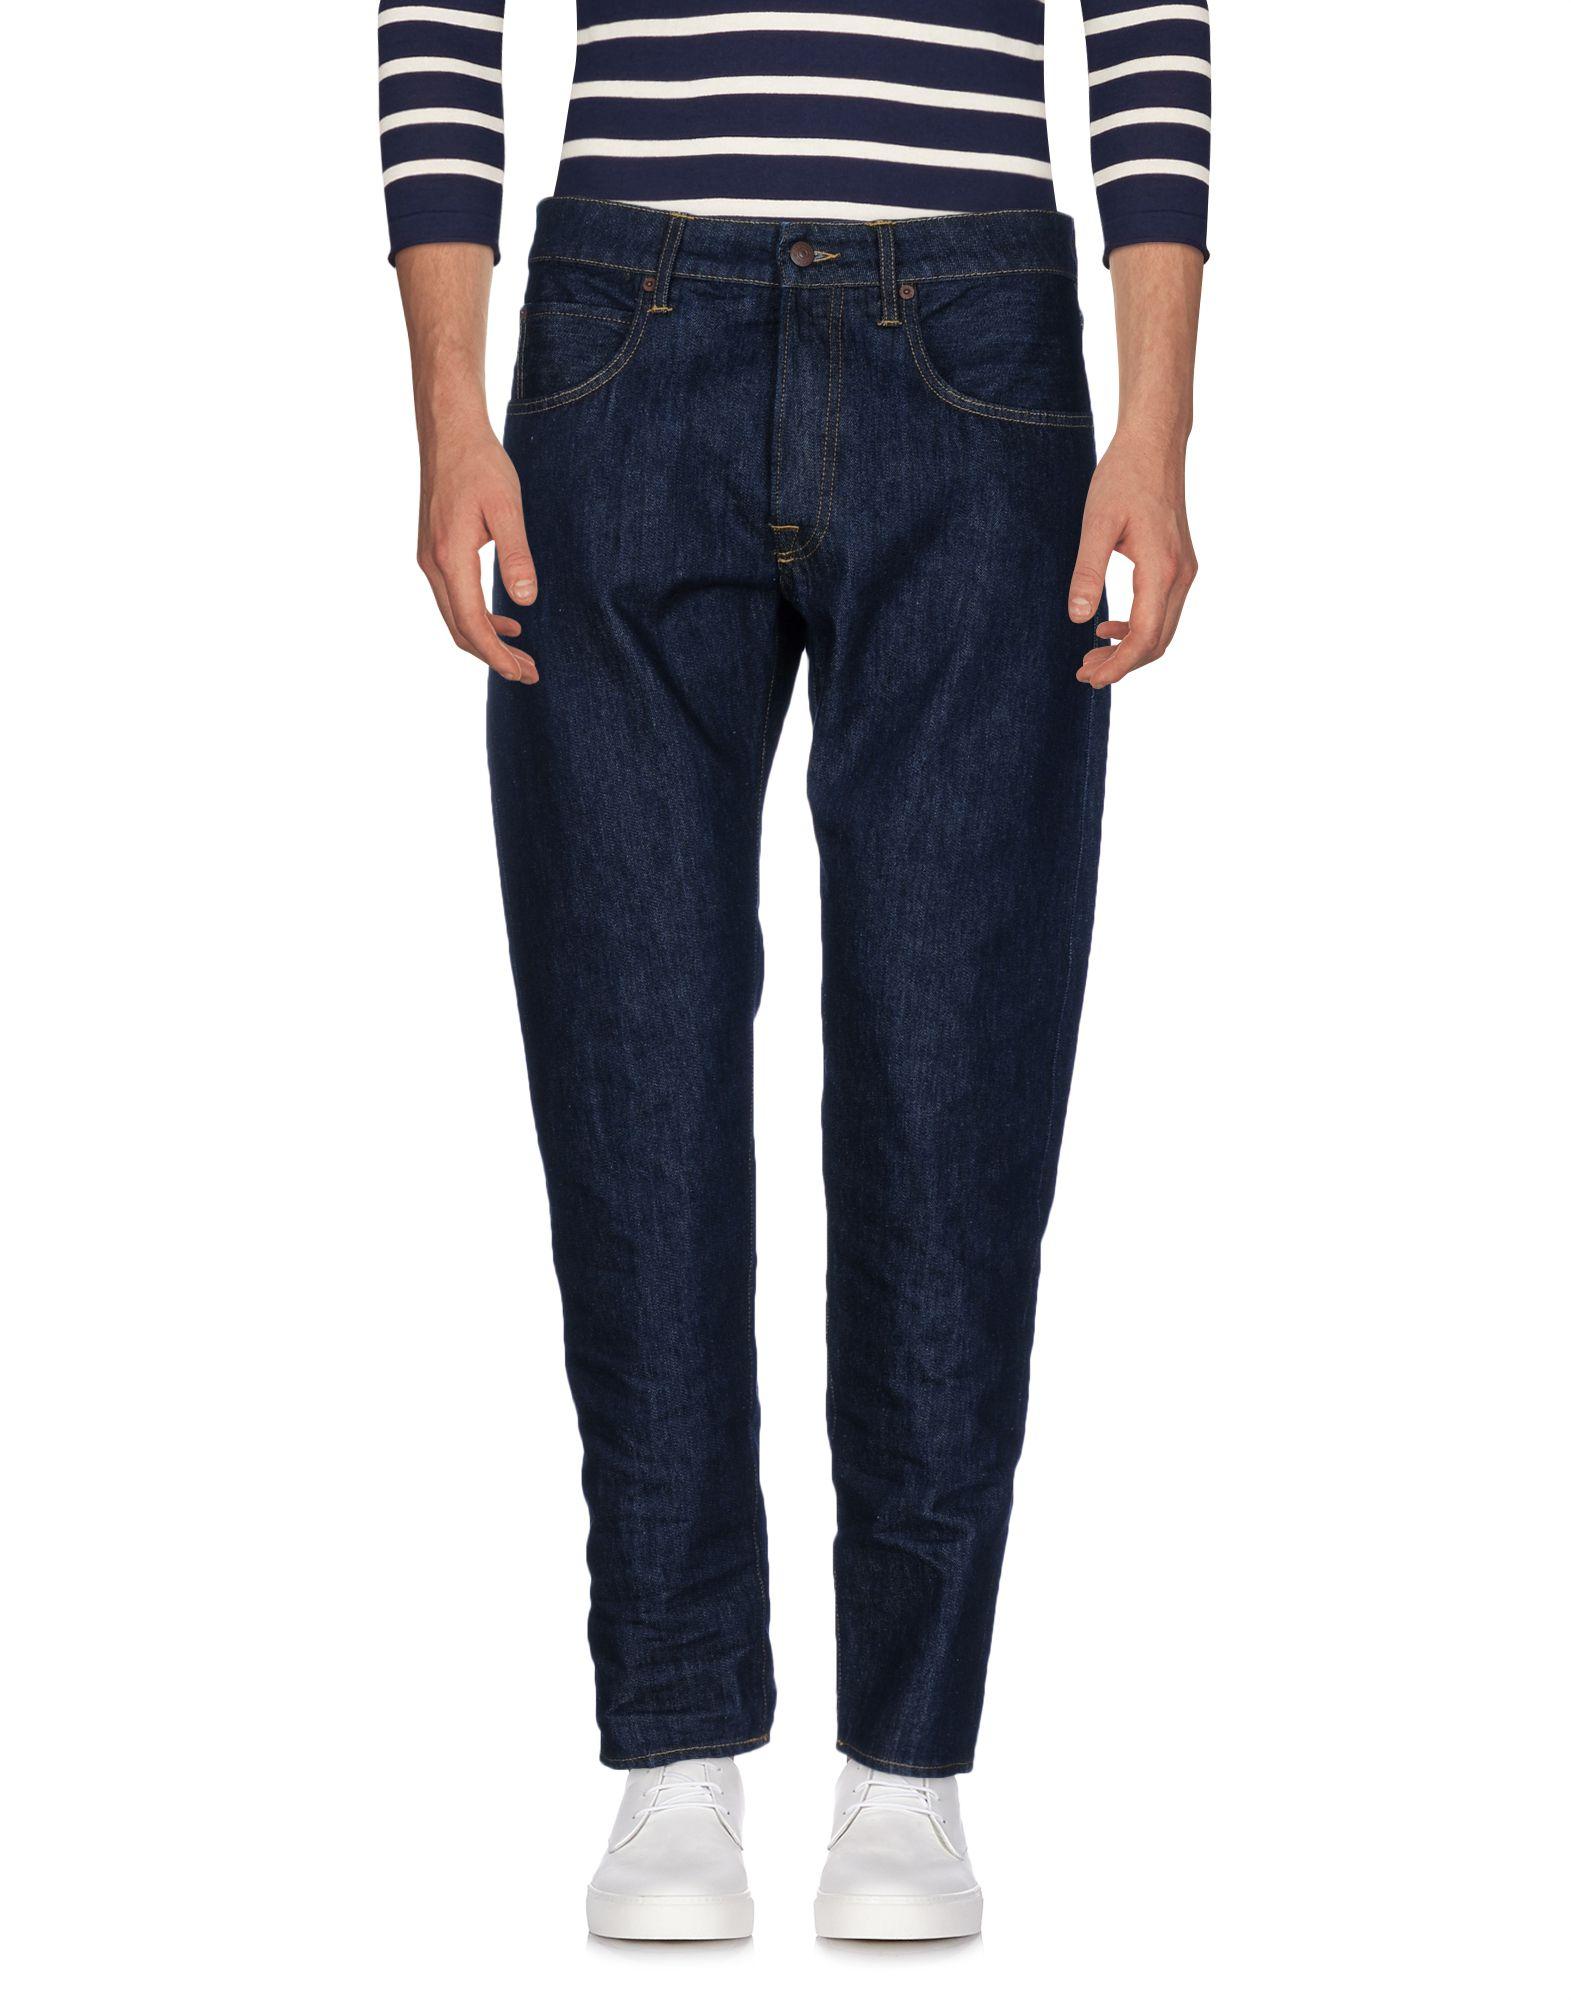 Pantaloni Jeans (+) People Uomo - 42636620WH 42636620WH 42636620WH 058eba